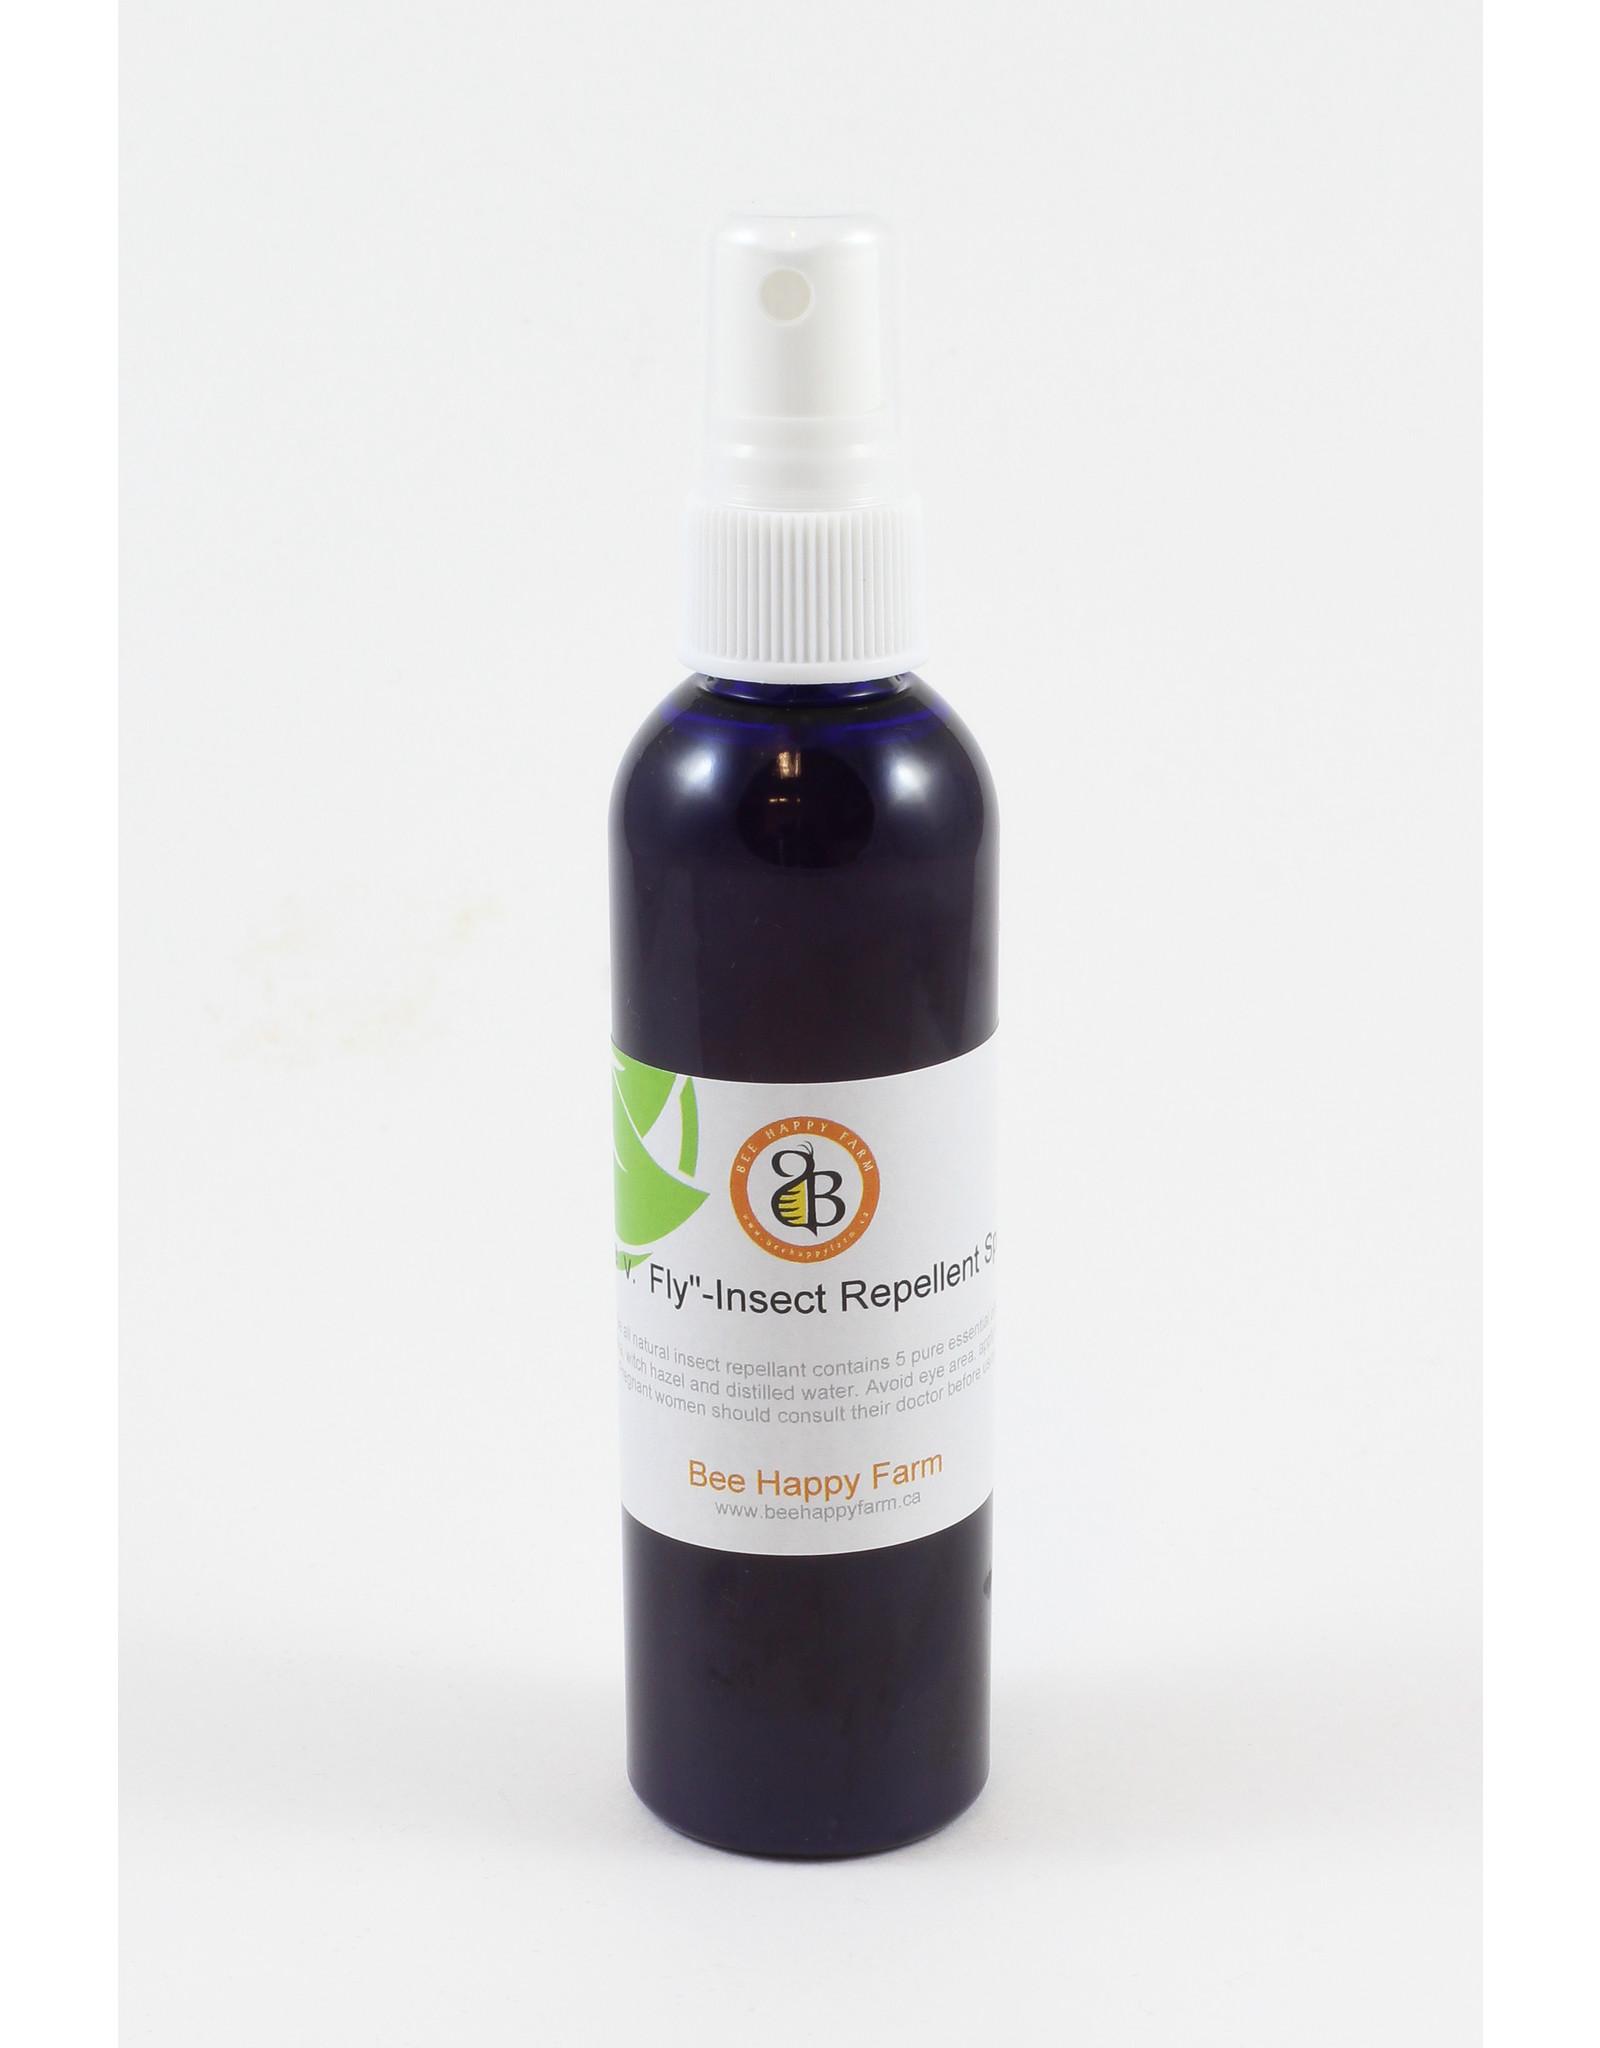 Iris Kedmi Five V. Fly Insect Repellent Spray by Bee Happy Farm